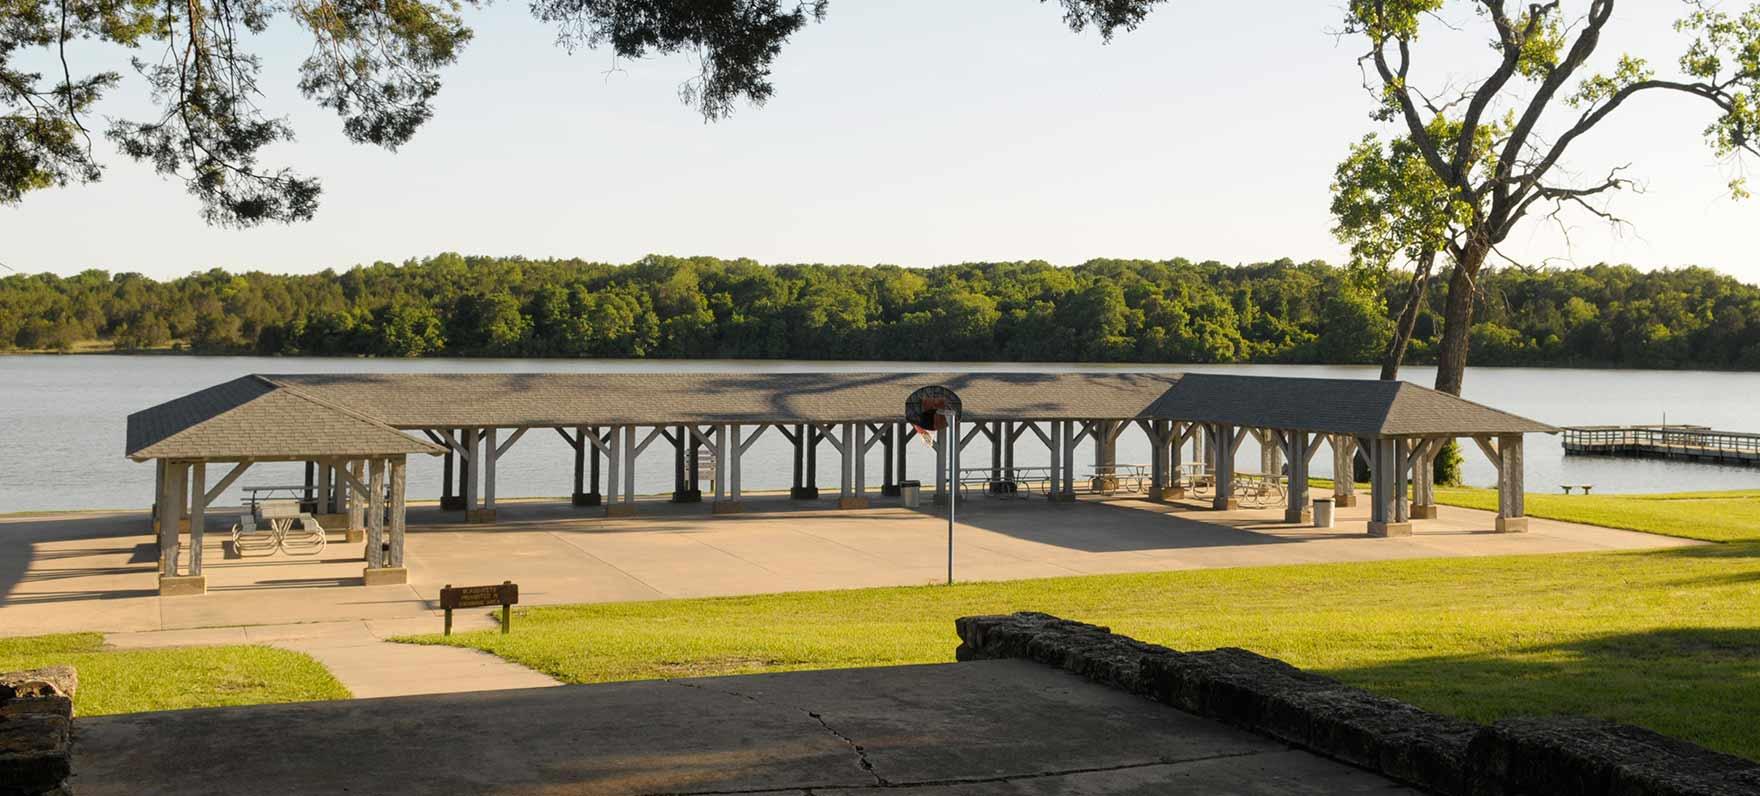 Bonham State Park — Texas Parks & Wildlife Department